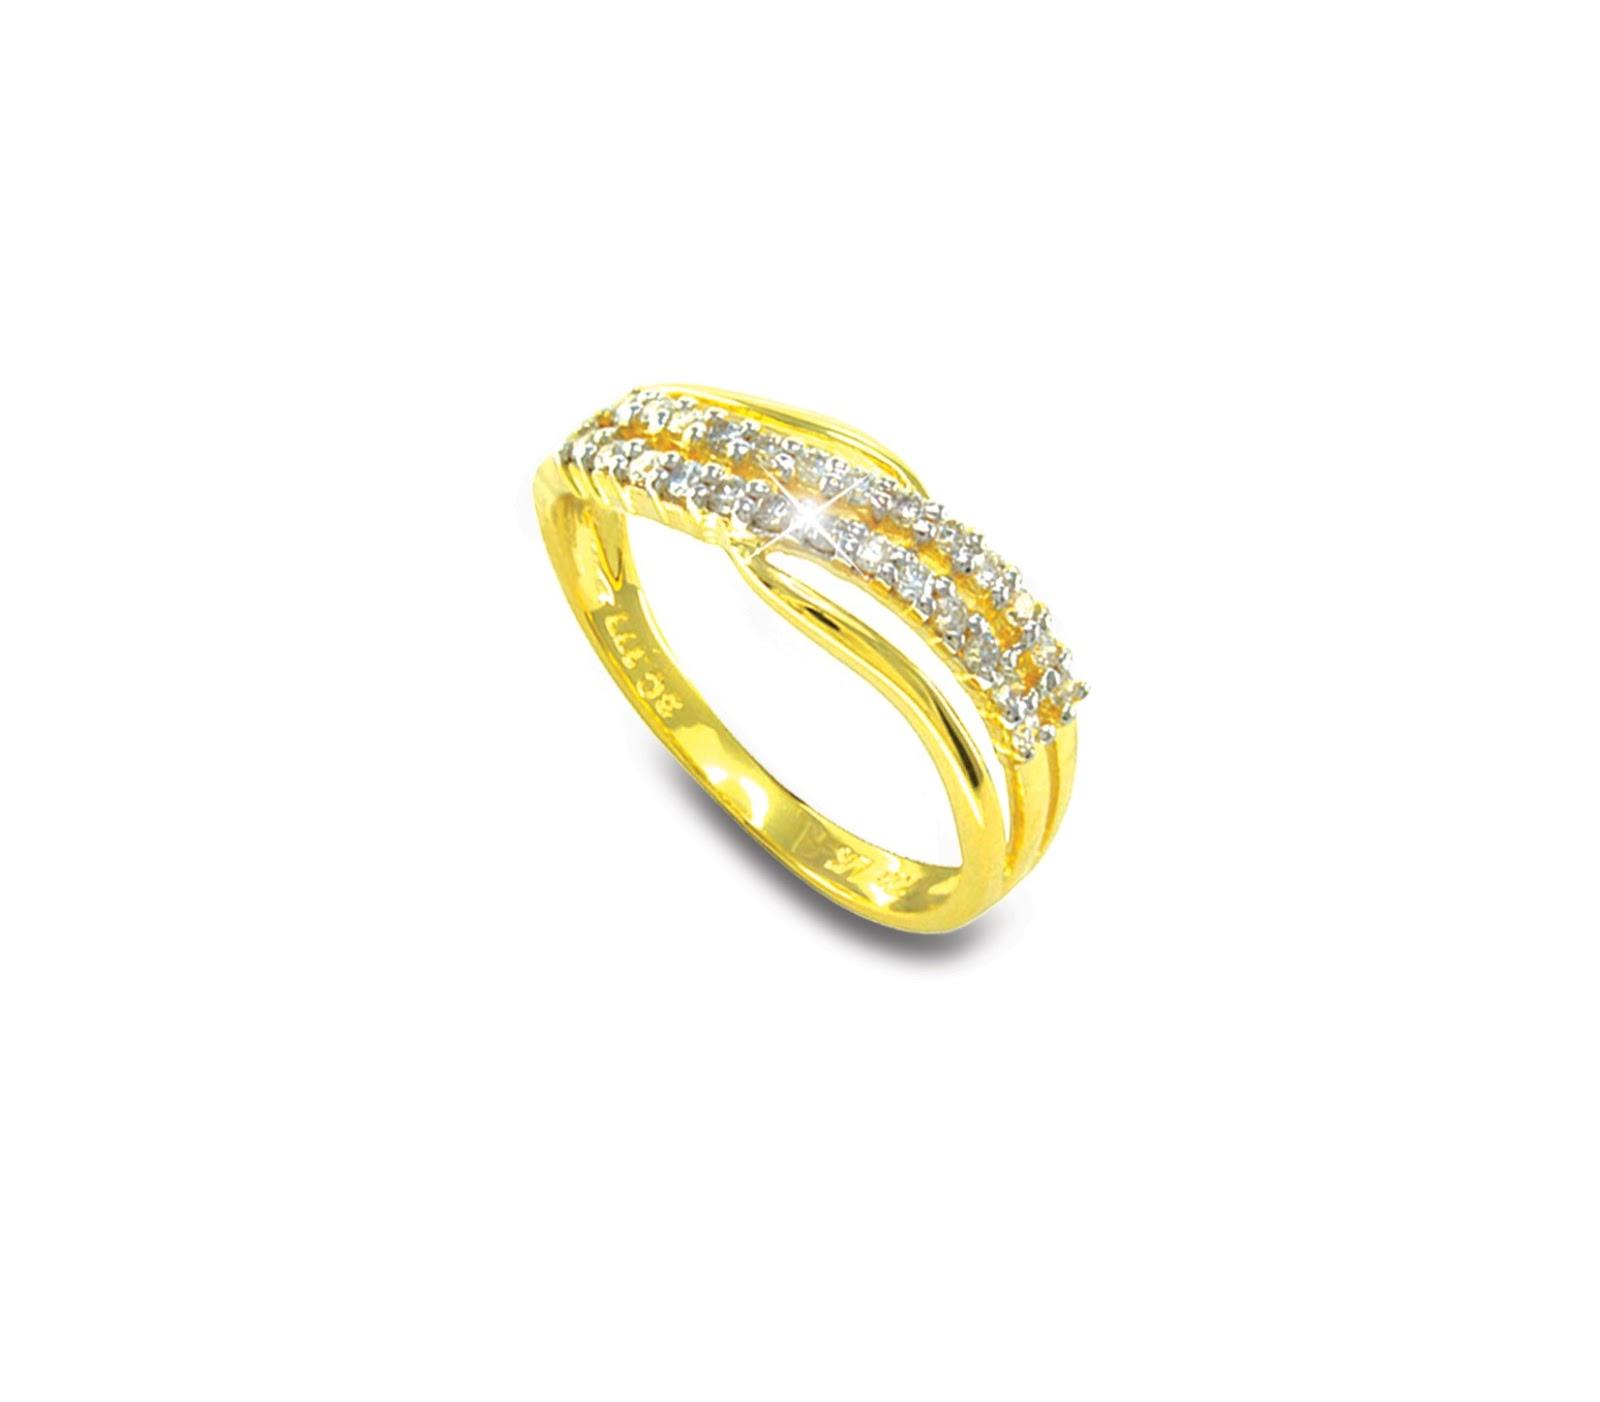 Wah Chan Gold Jewellery April 2016 Satu Set Jewelry Tunangan Kawin Pernikahan Berlian Emas Wedding Round Cincin Kuning 18k